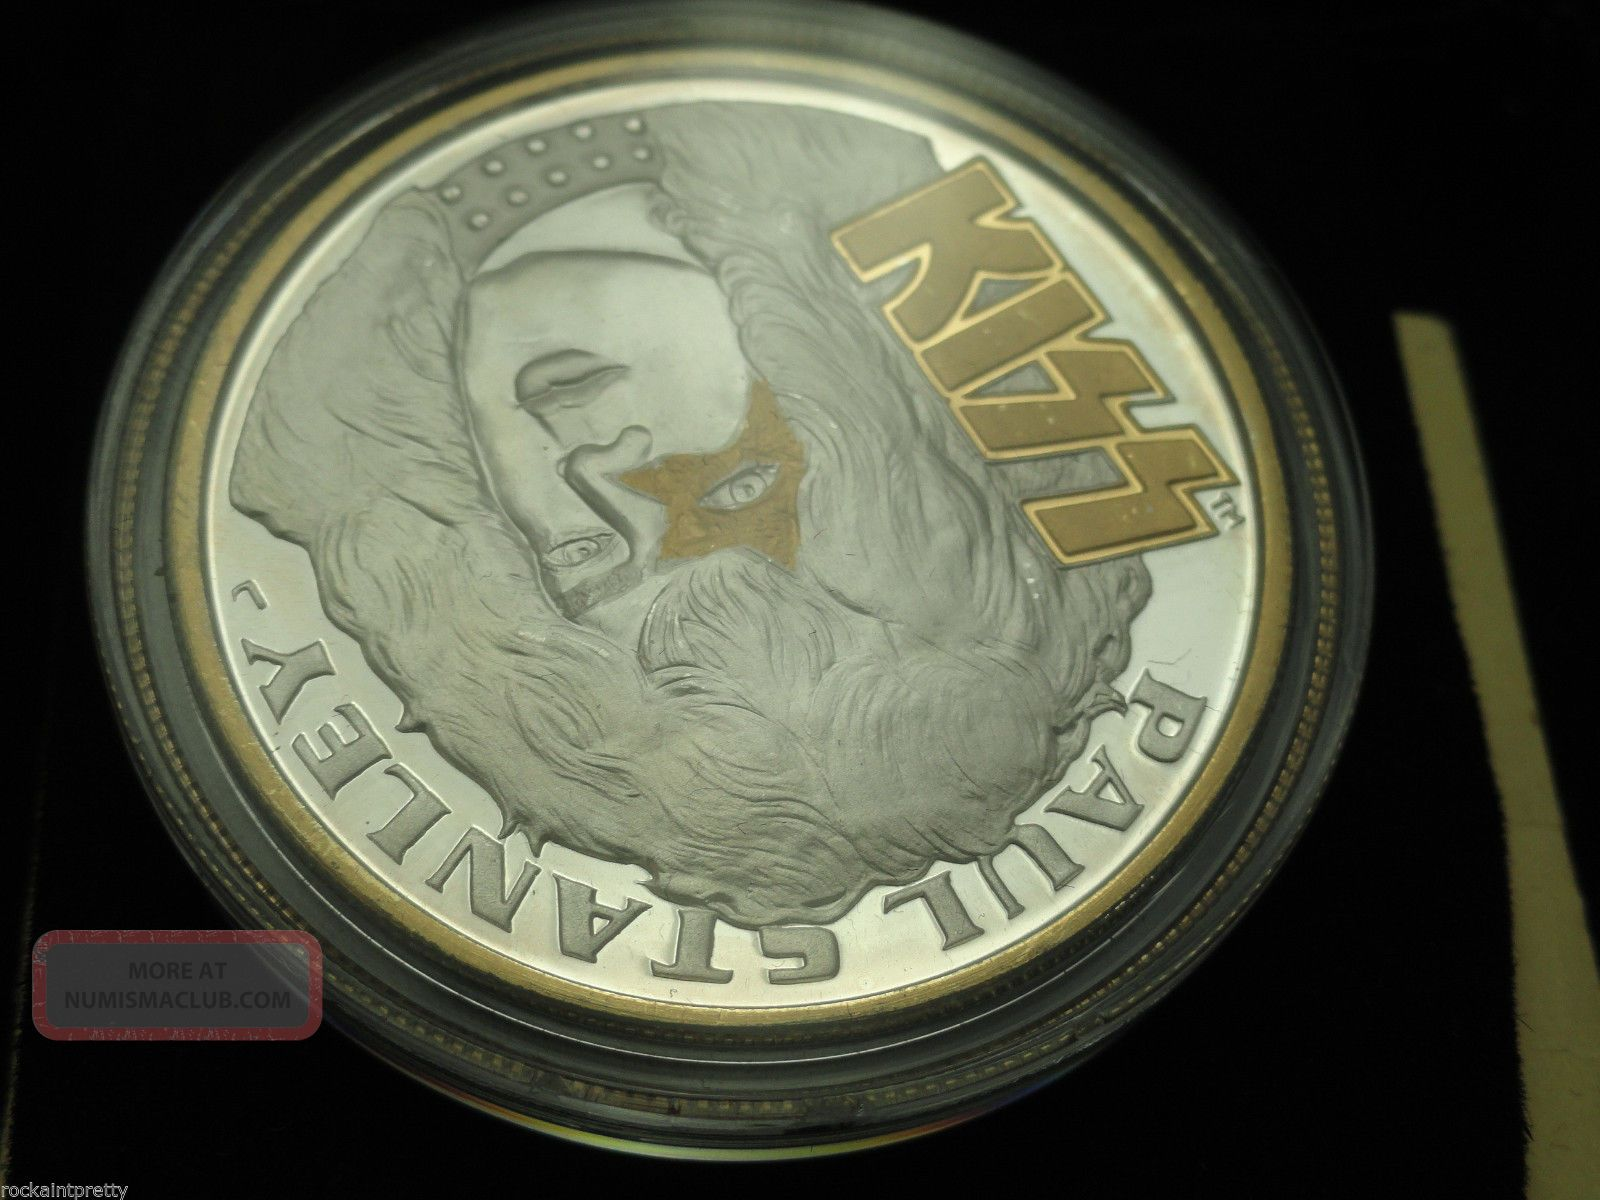 Kiss Coin 1oz 999 Paul Stanley Silver Psycho Circus Tour 1998 1999 C226